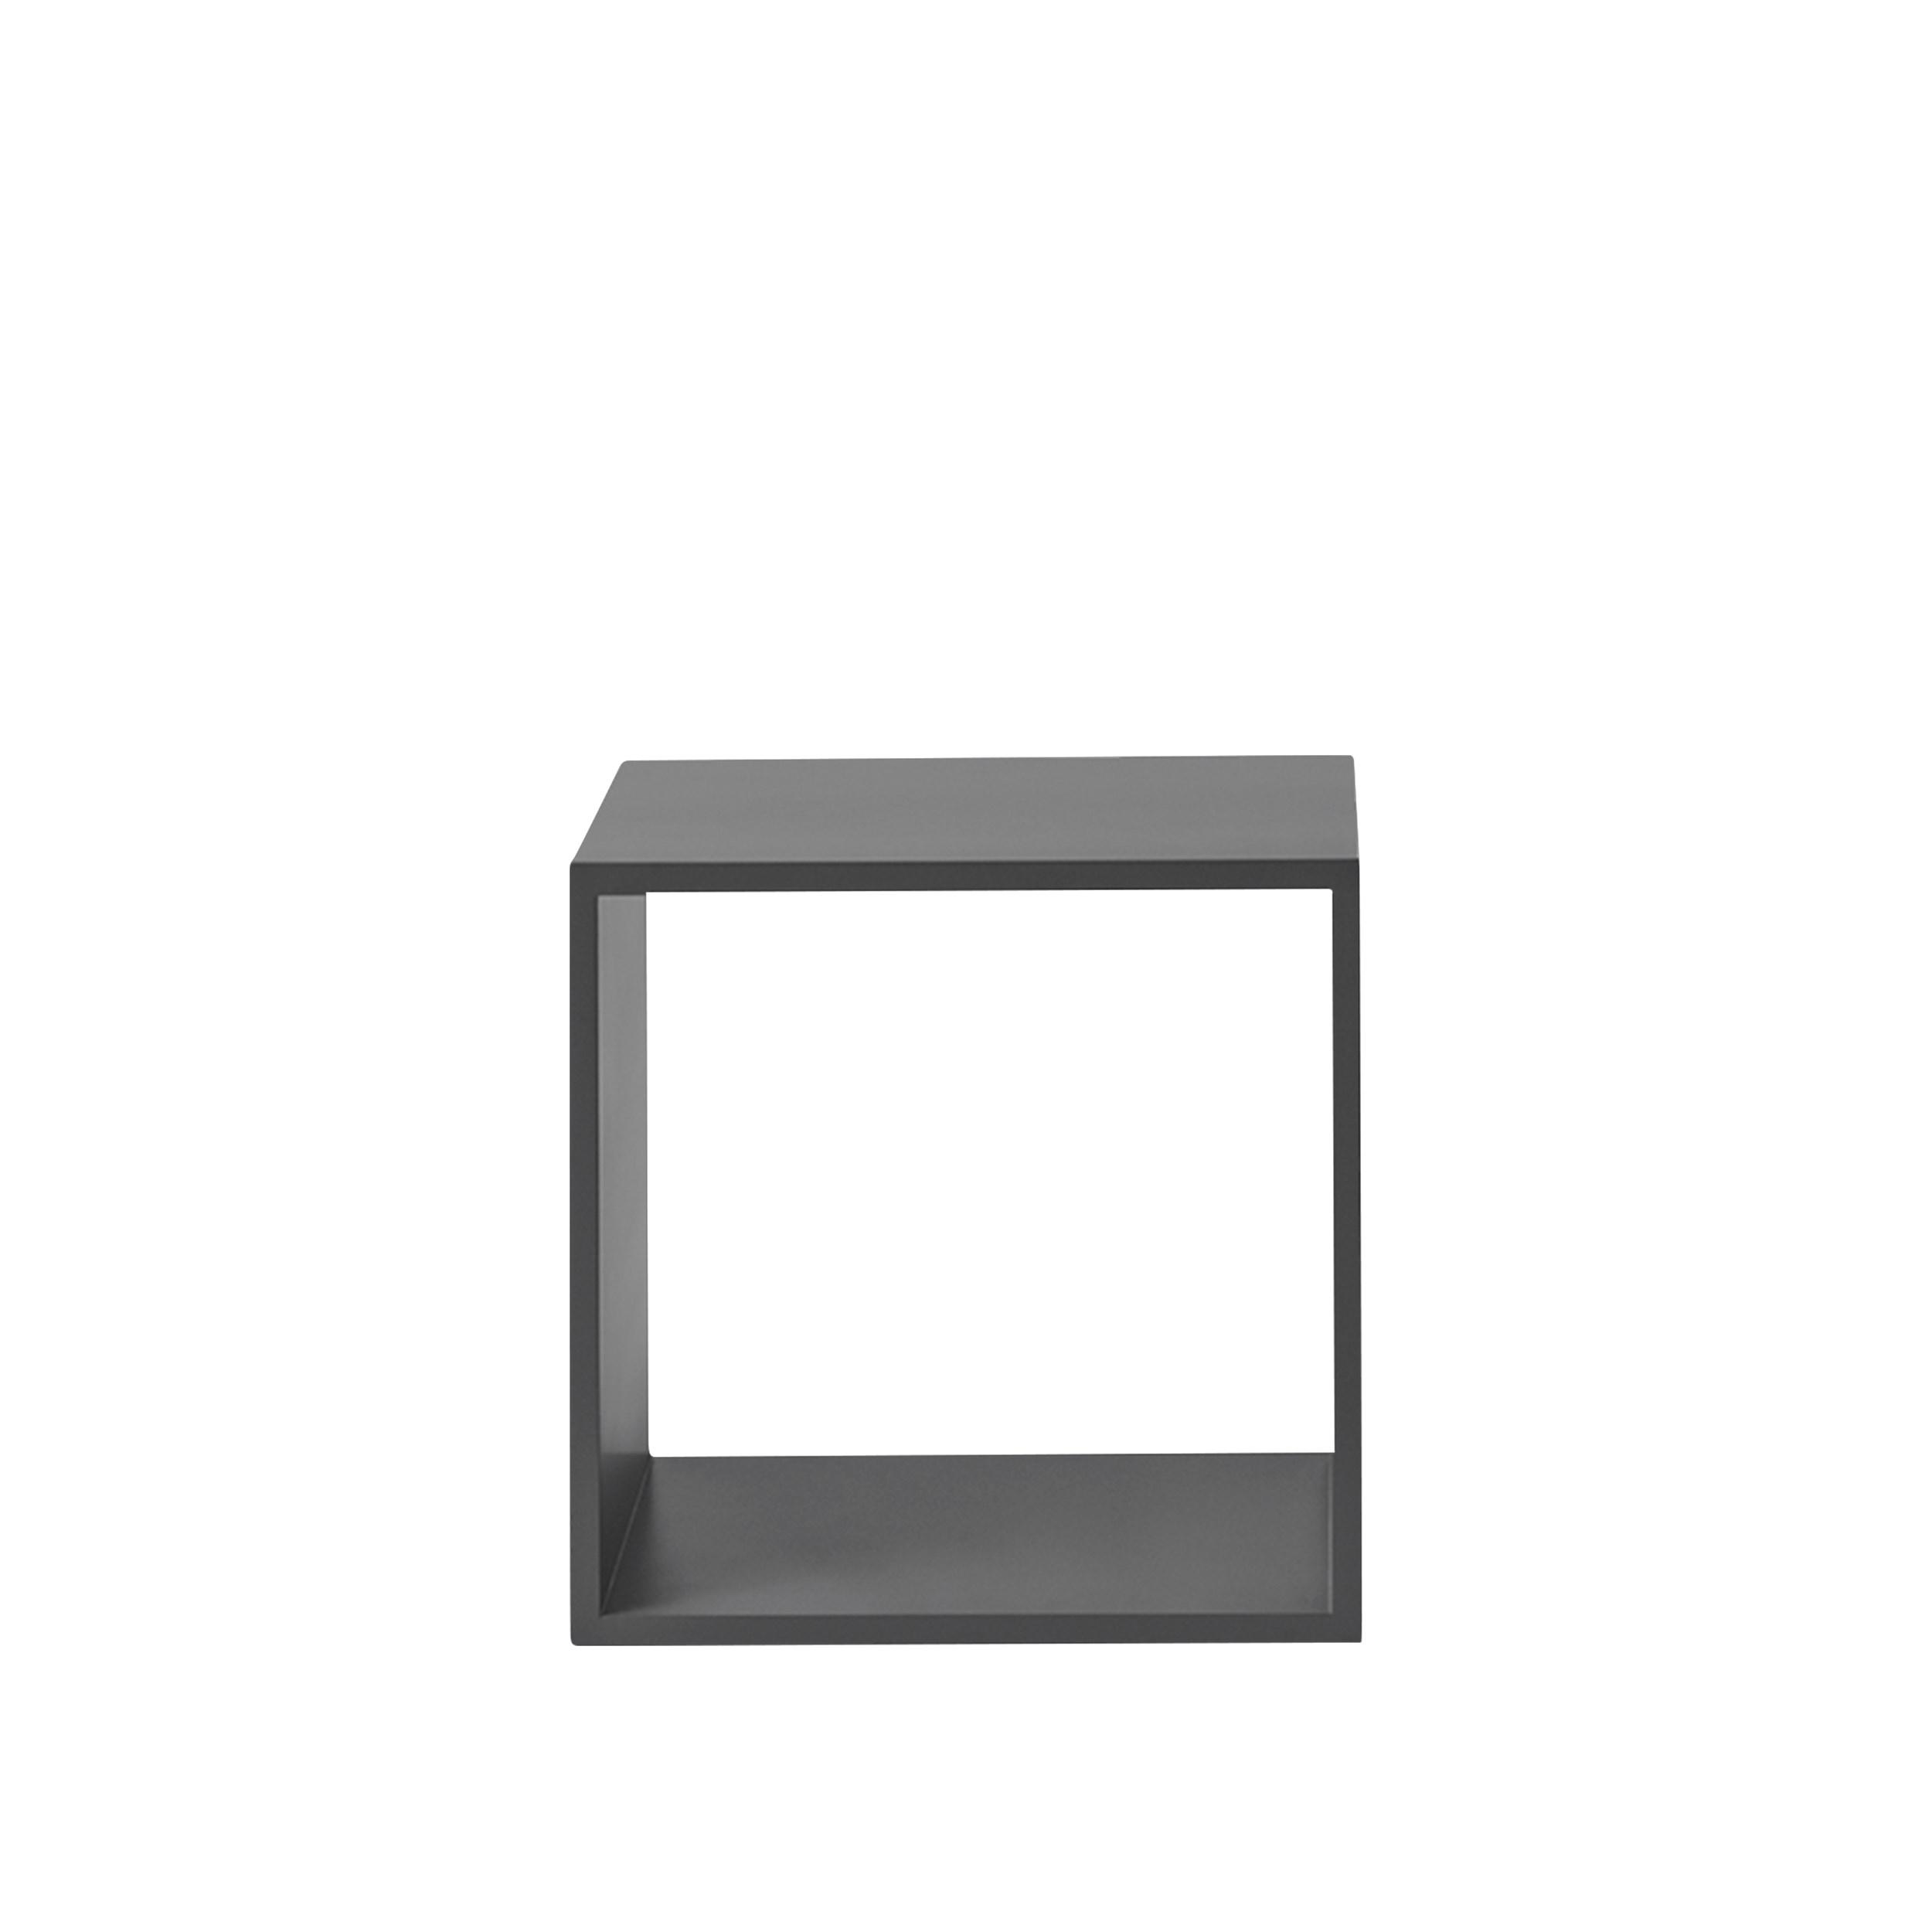 Stacked 2.0 medium open grey